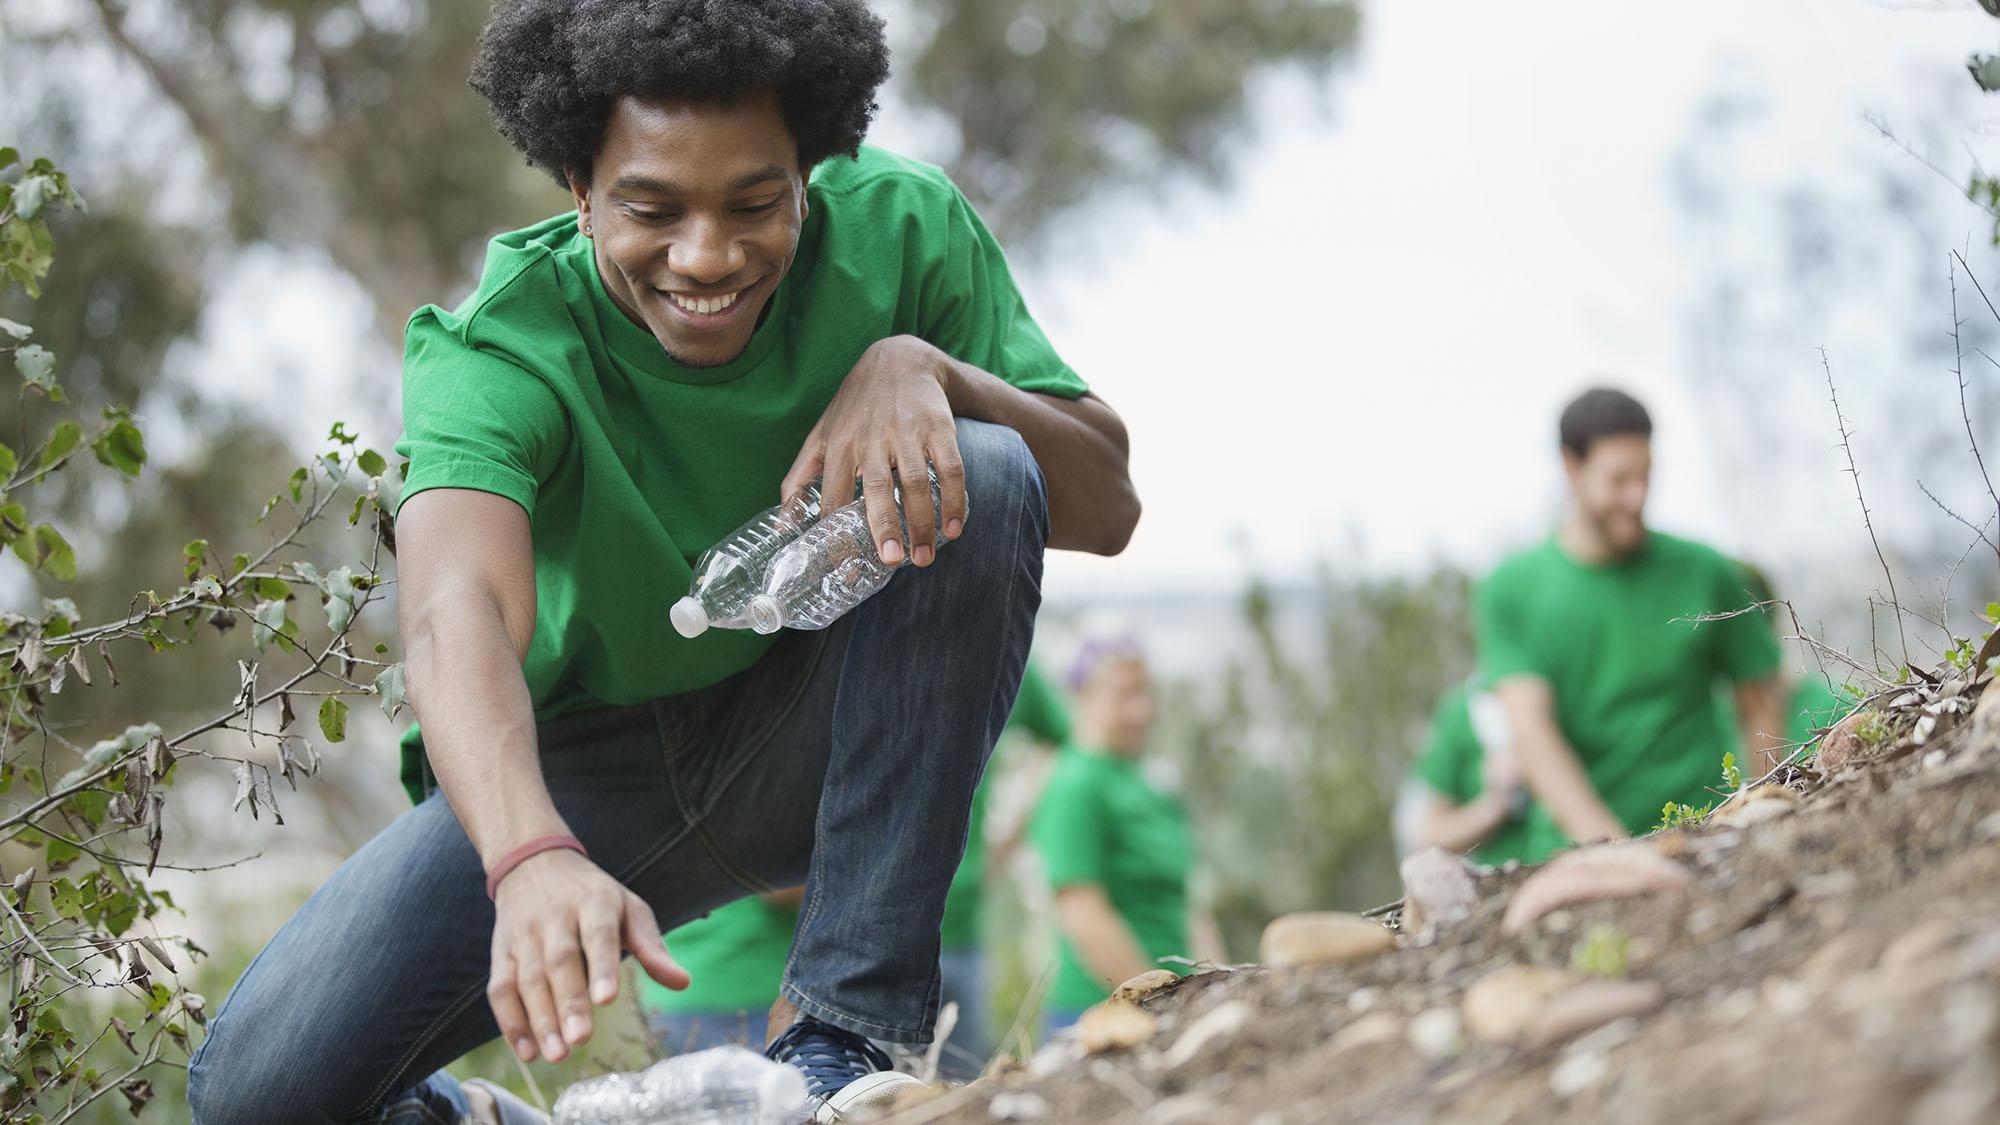 Recycling volunteers